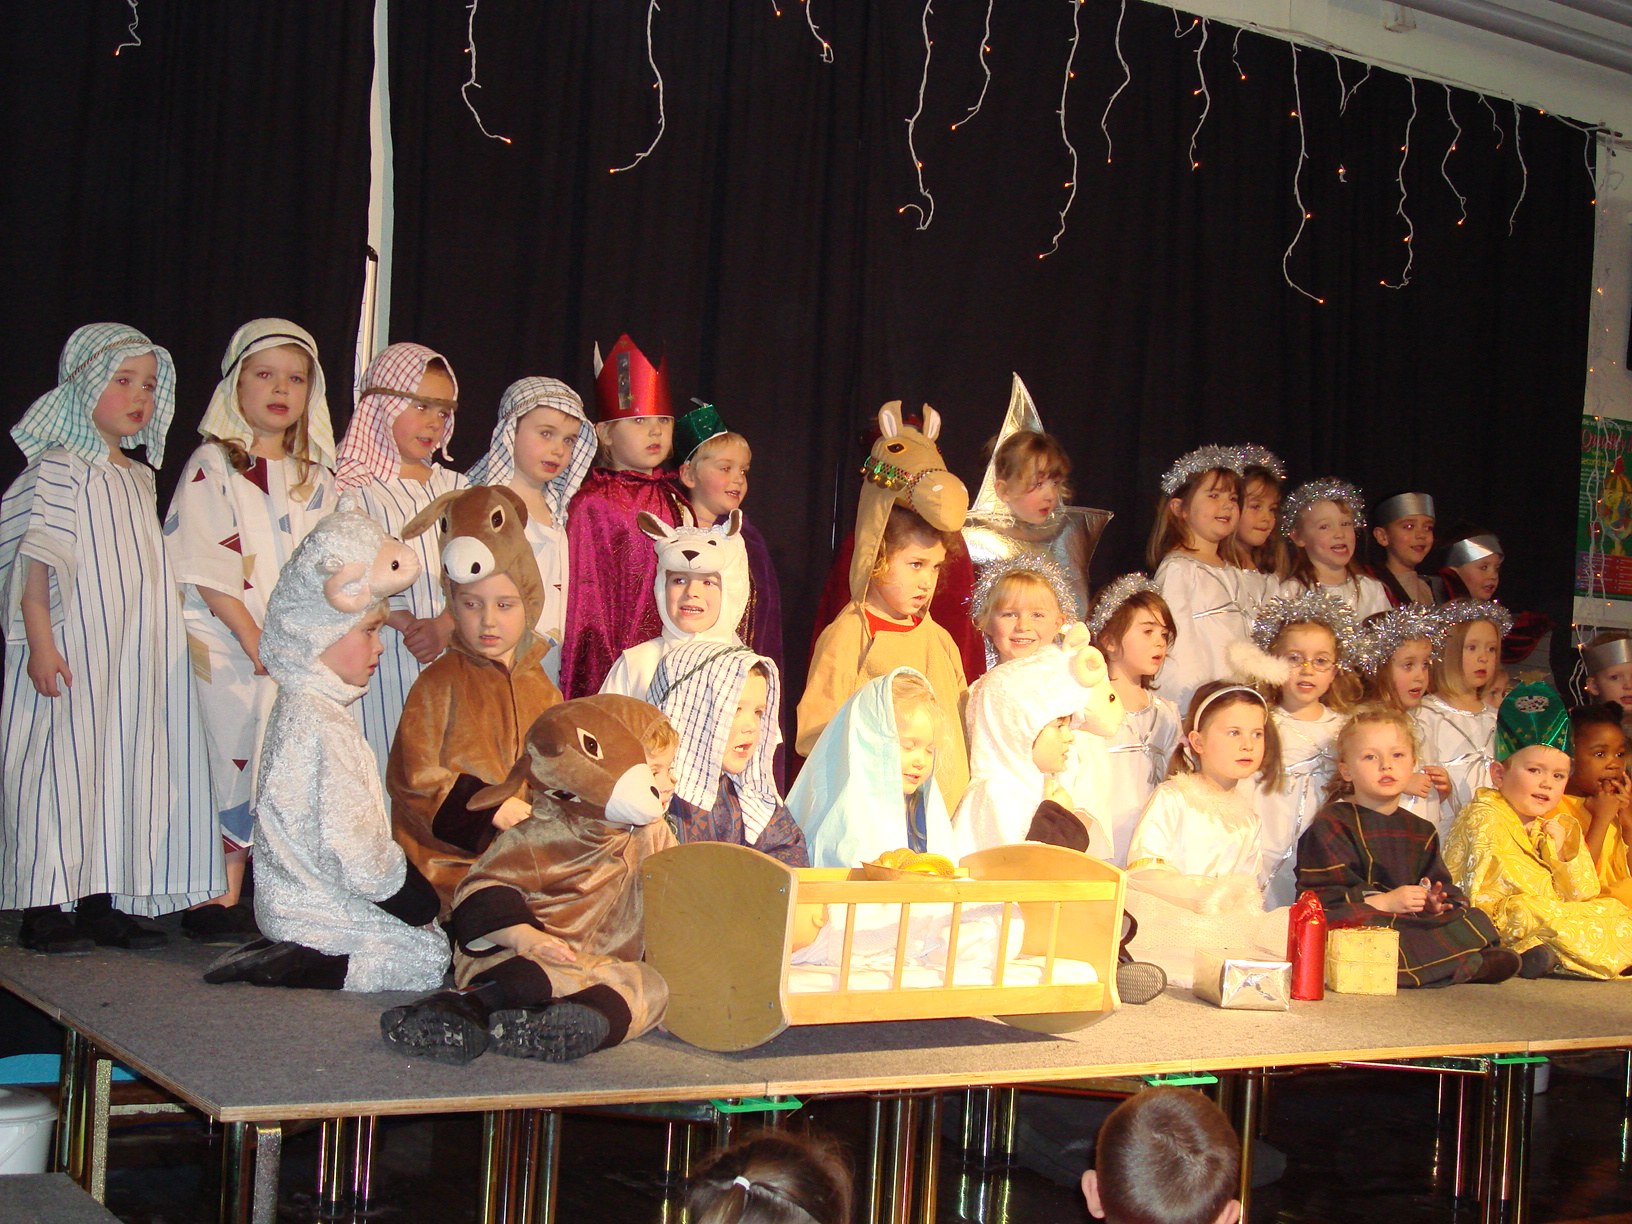 Lowercroft Primary School Nativity Play David Nuttall